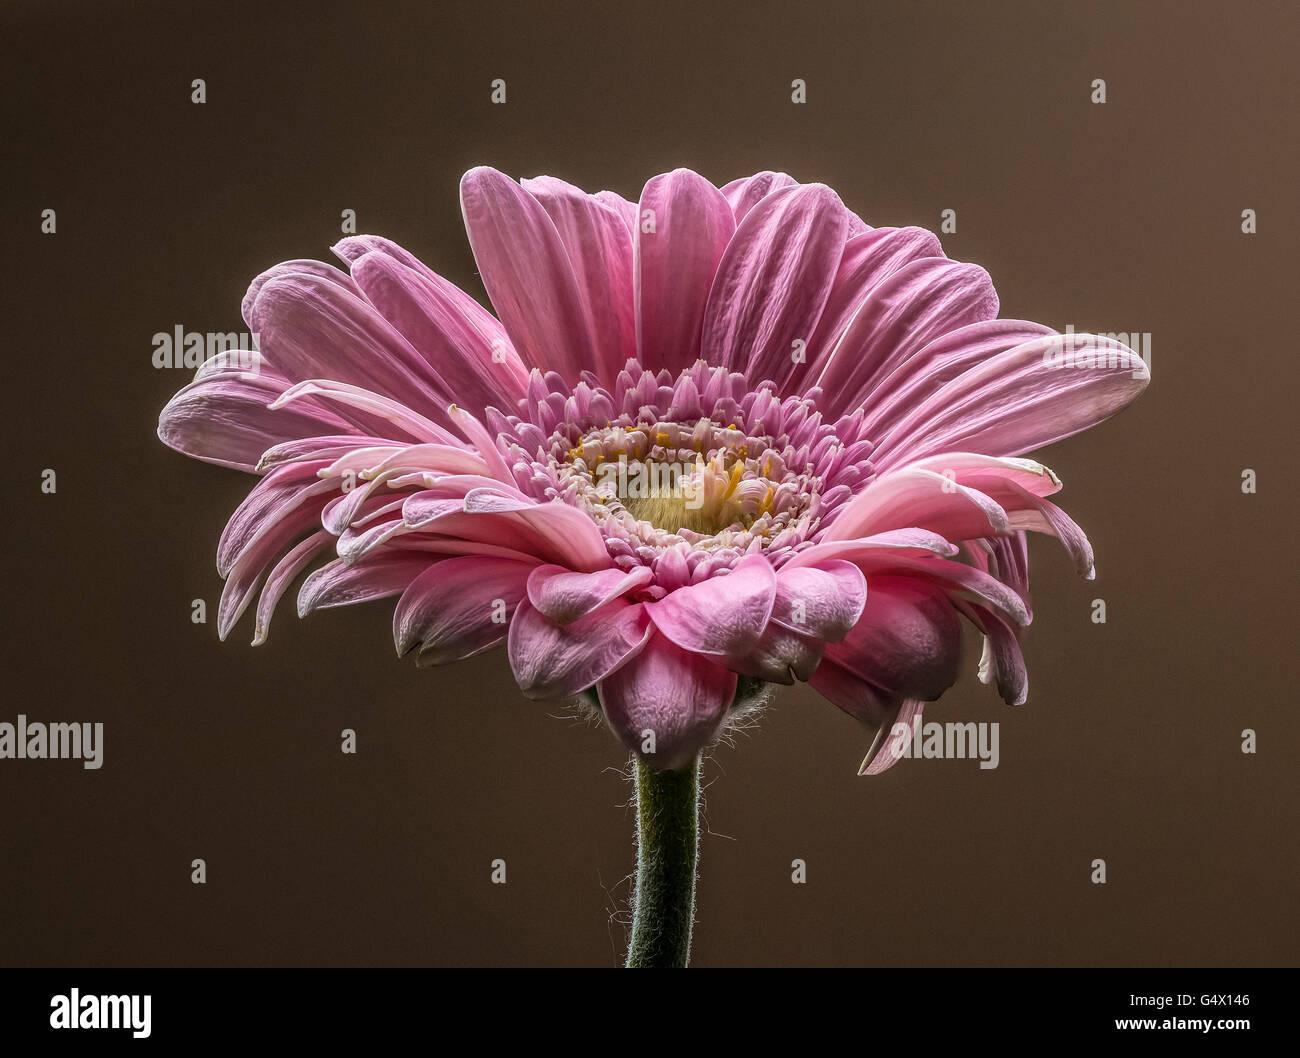 Gerbera Flower taken using Focus Stacking Technique - Stock Image